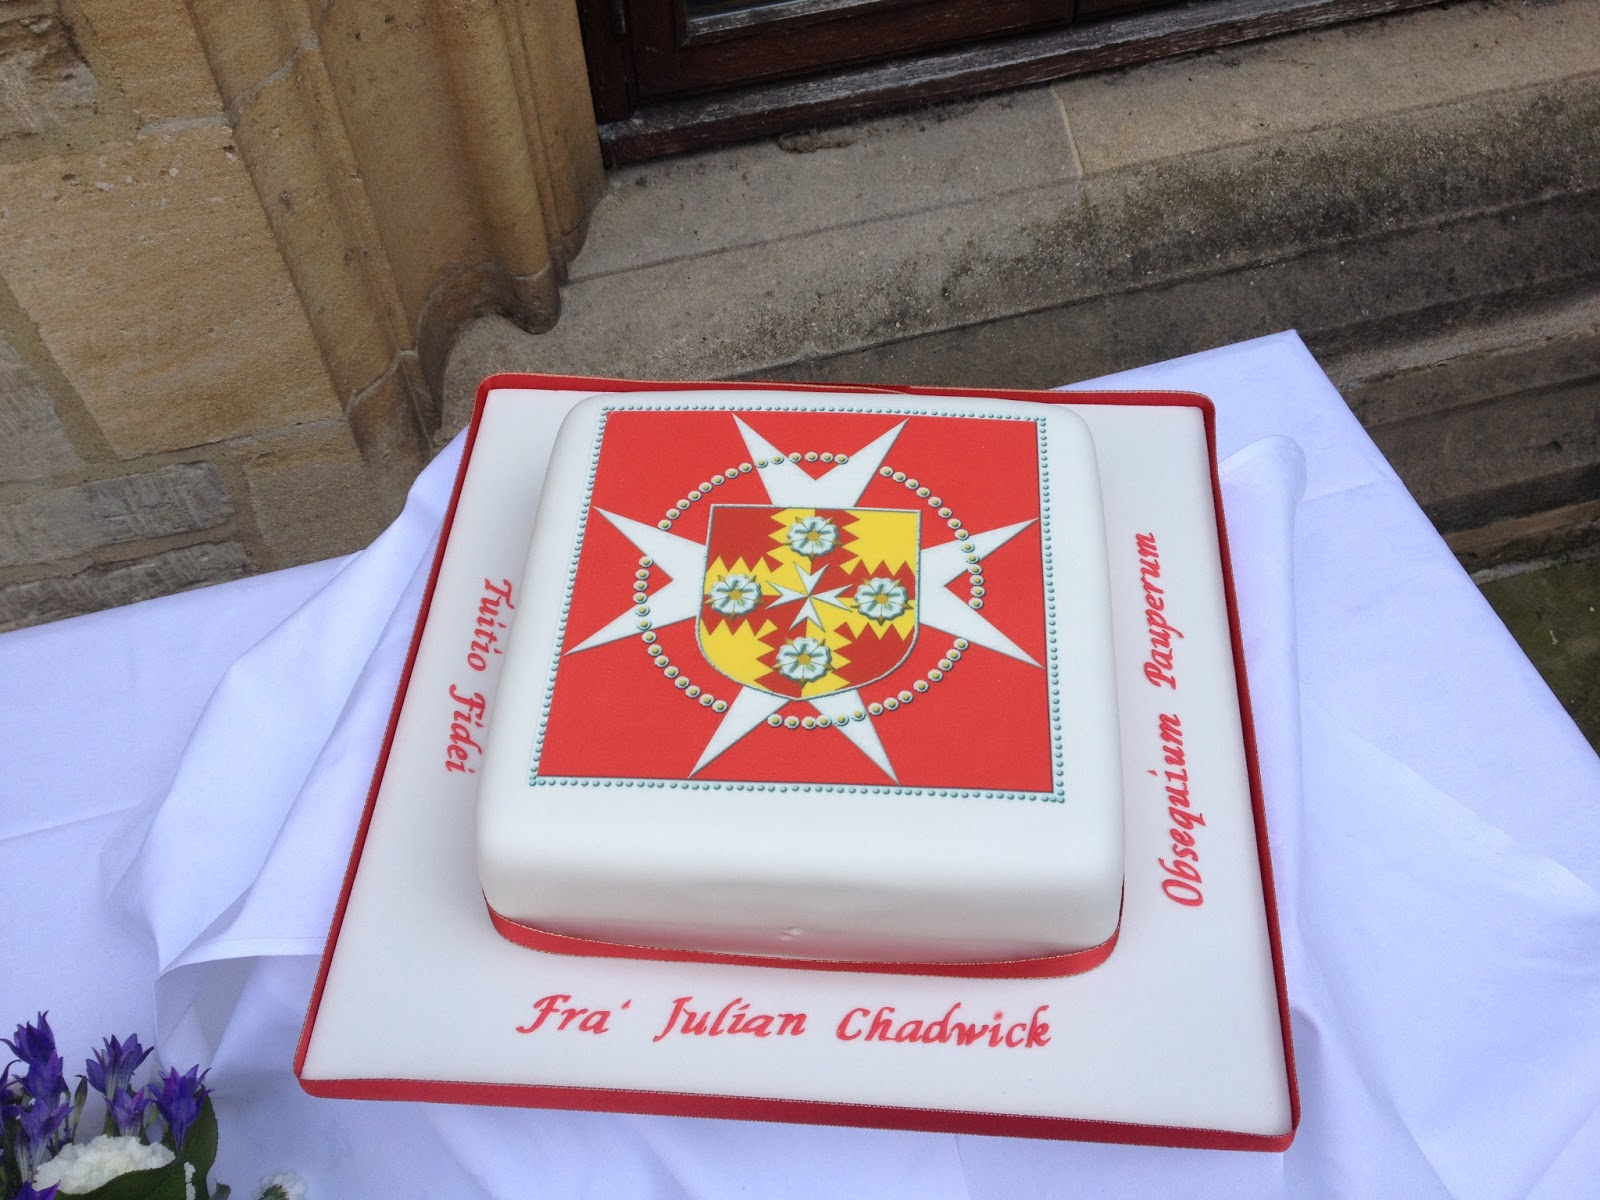 Pope Francis Birthday Cake Design